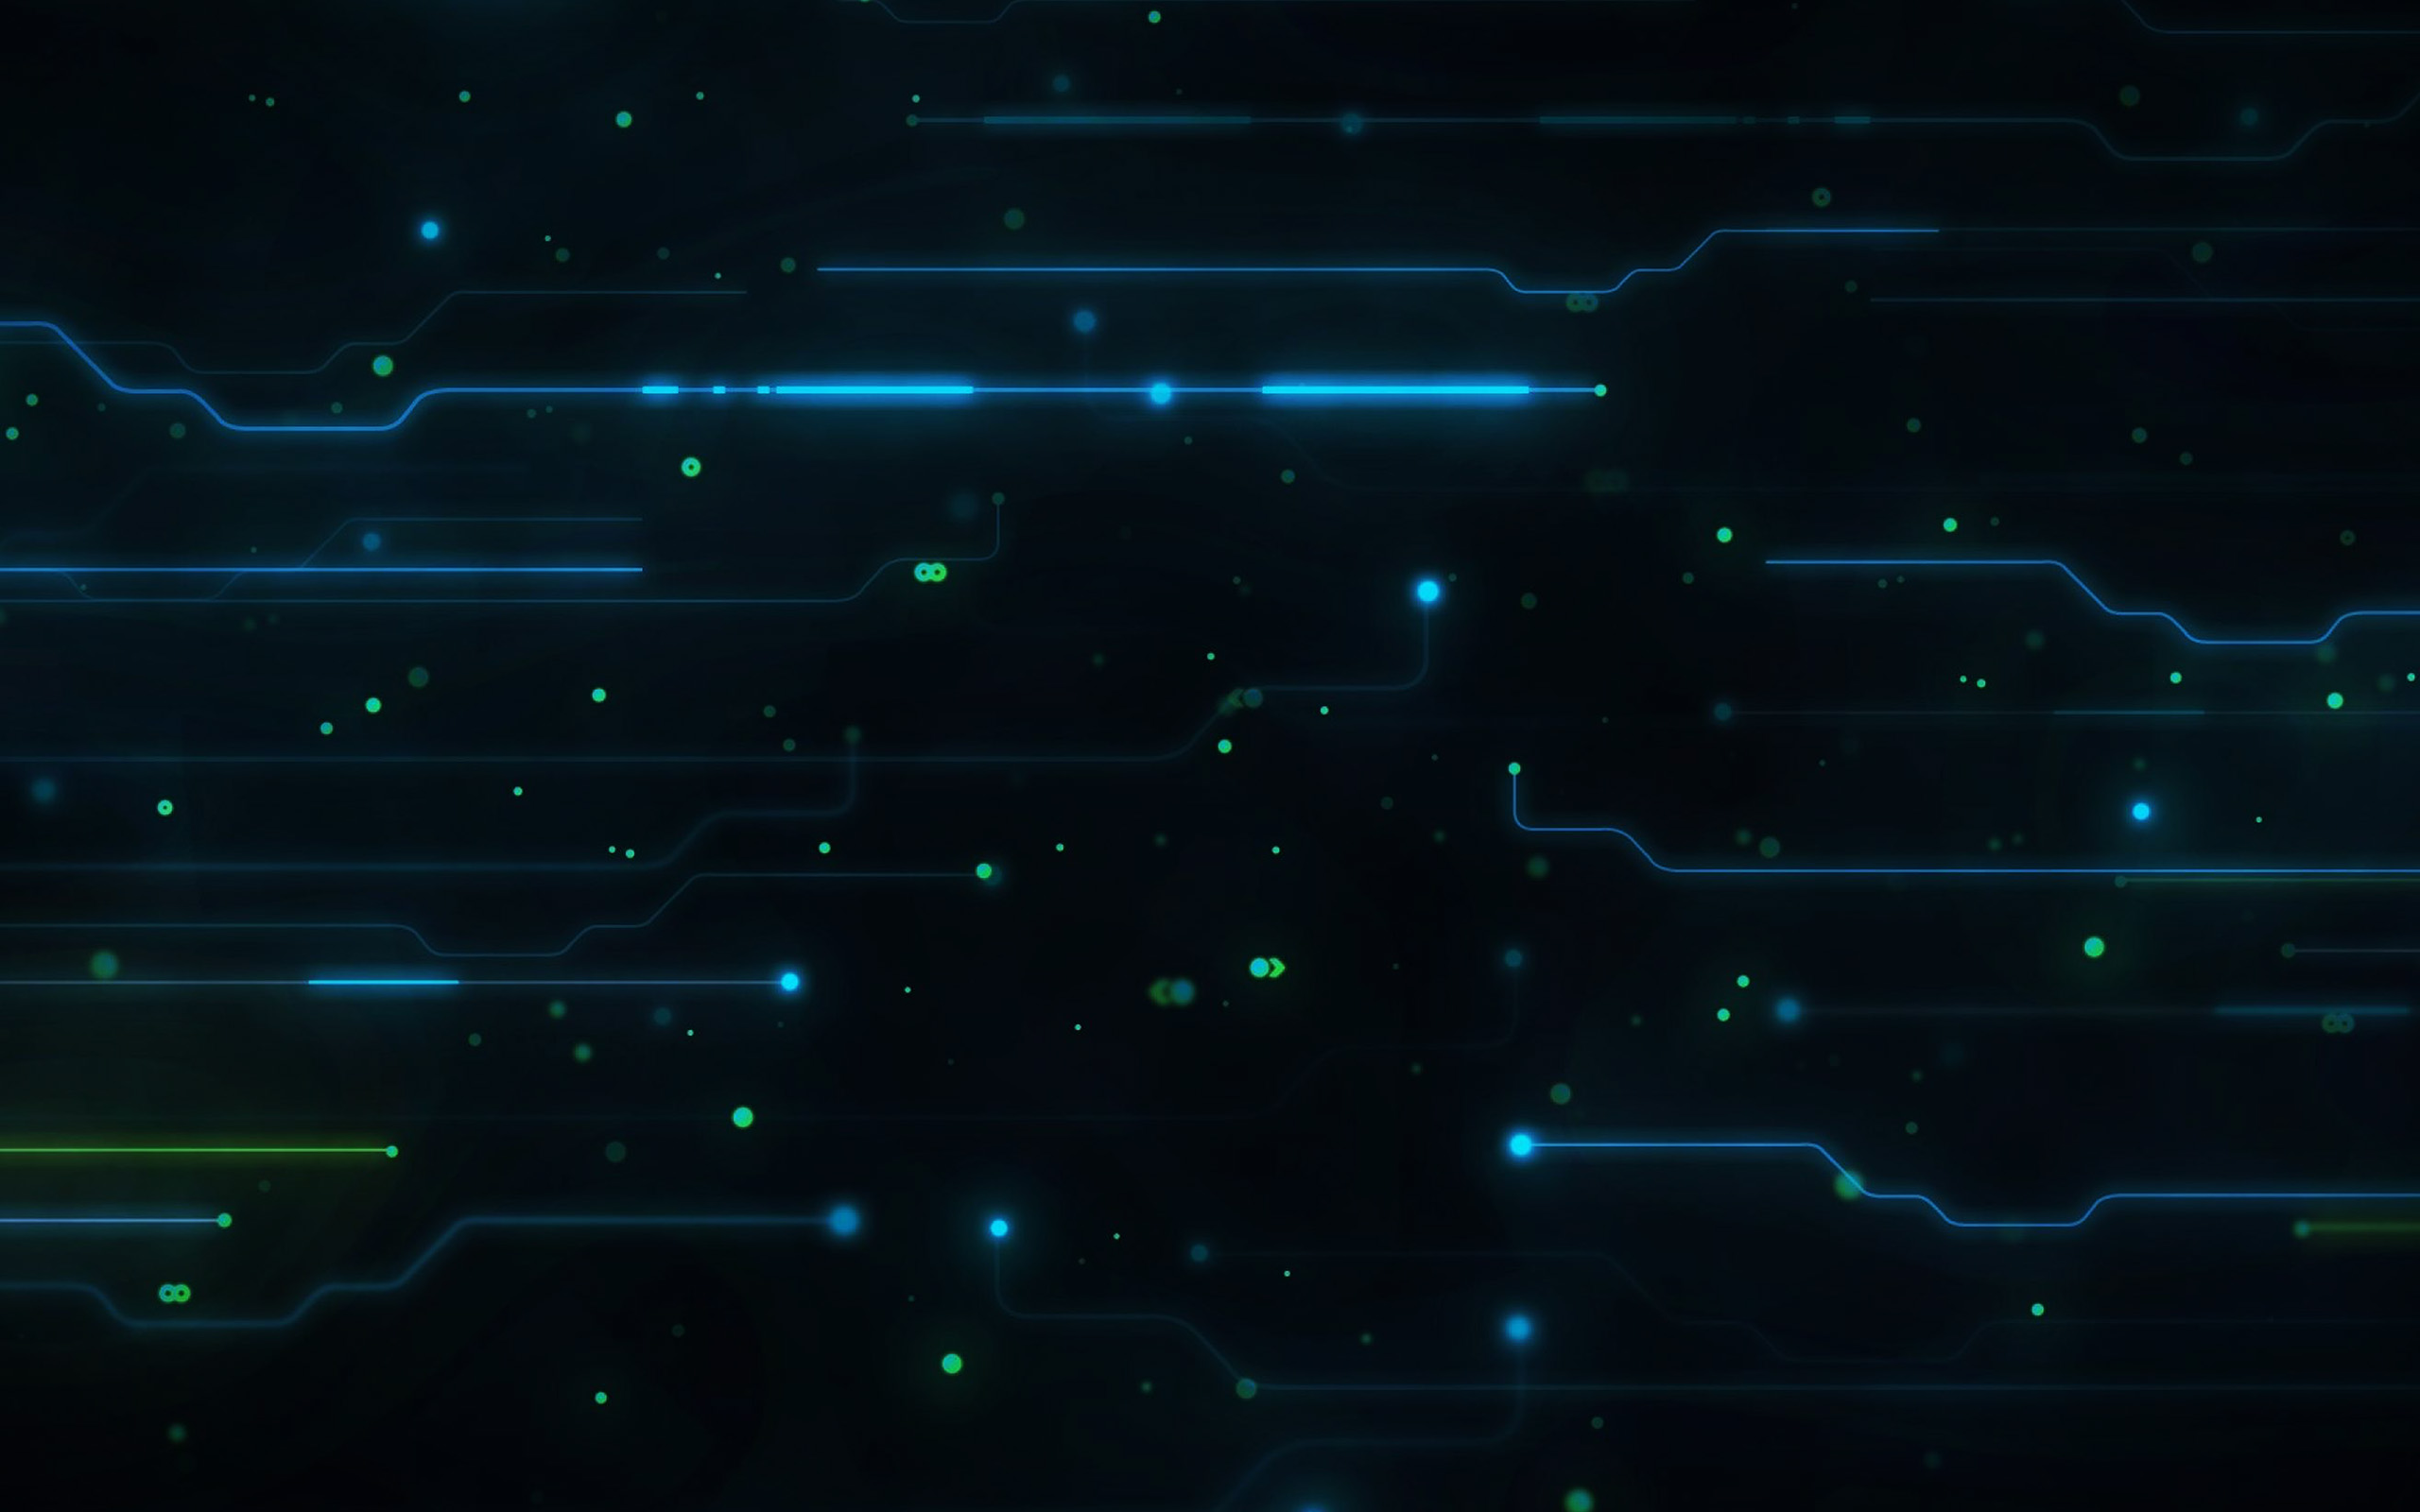 wallpaper for desktop, laptop   vo09-dark-digital-art ...